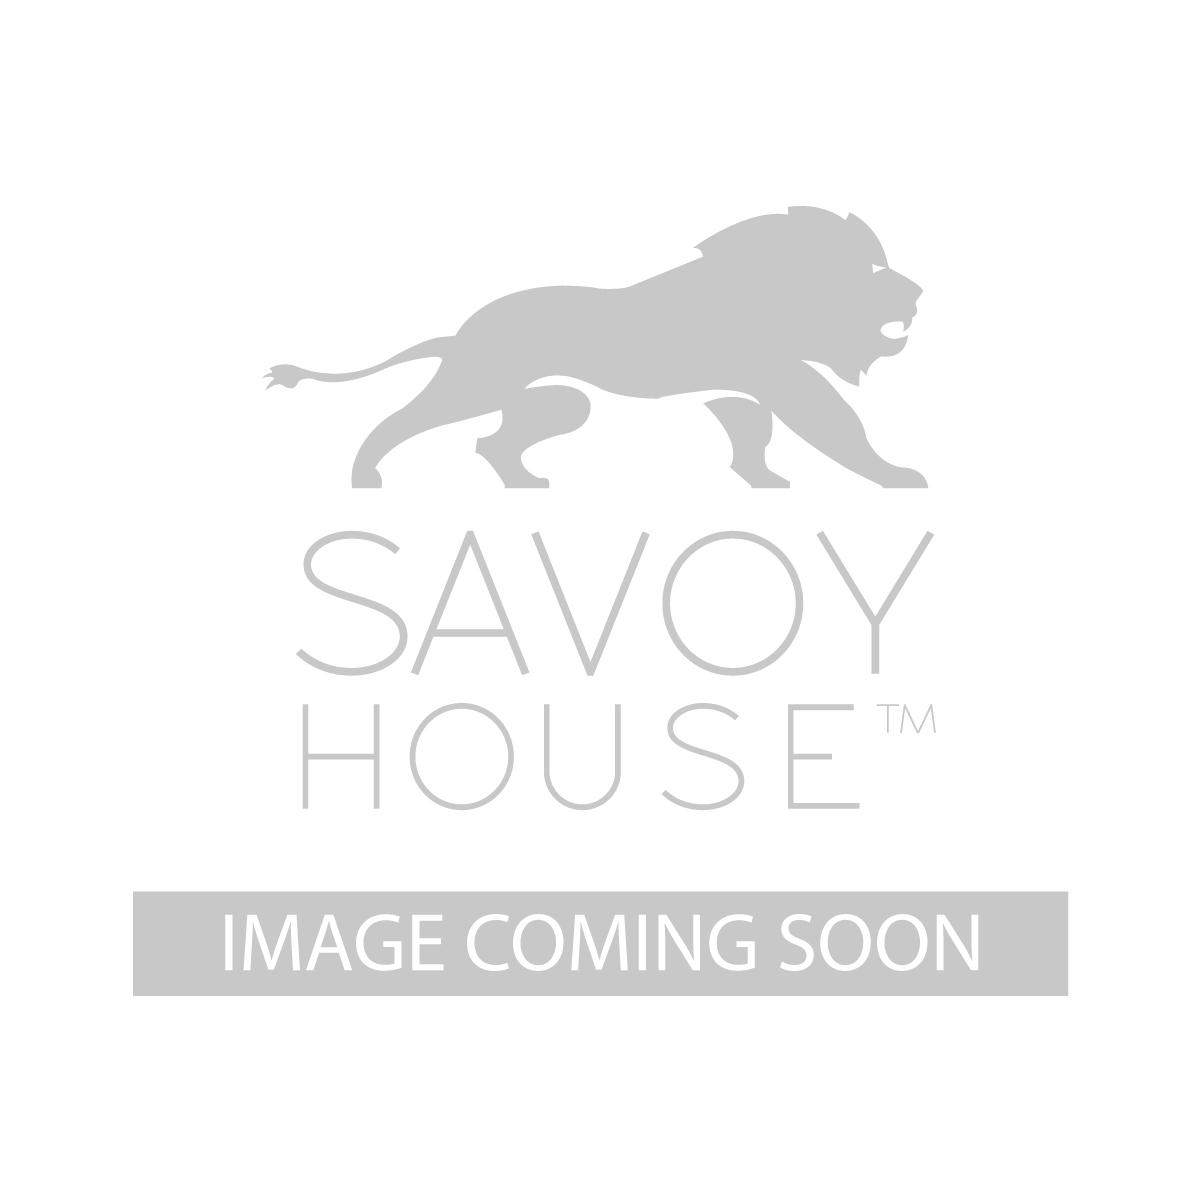 8-890-3-SN Kane 3 Light Bath Bar by Savoy House